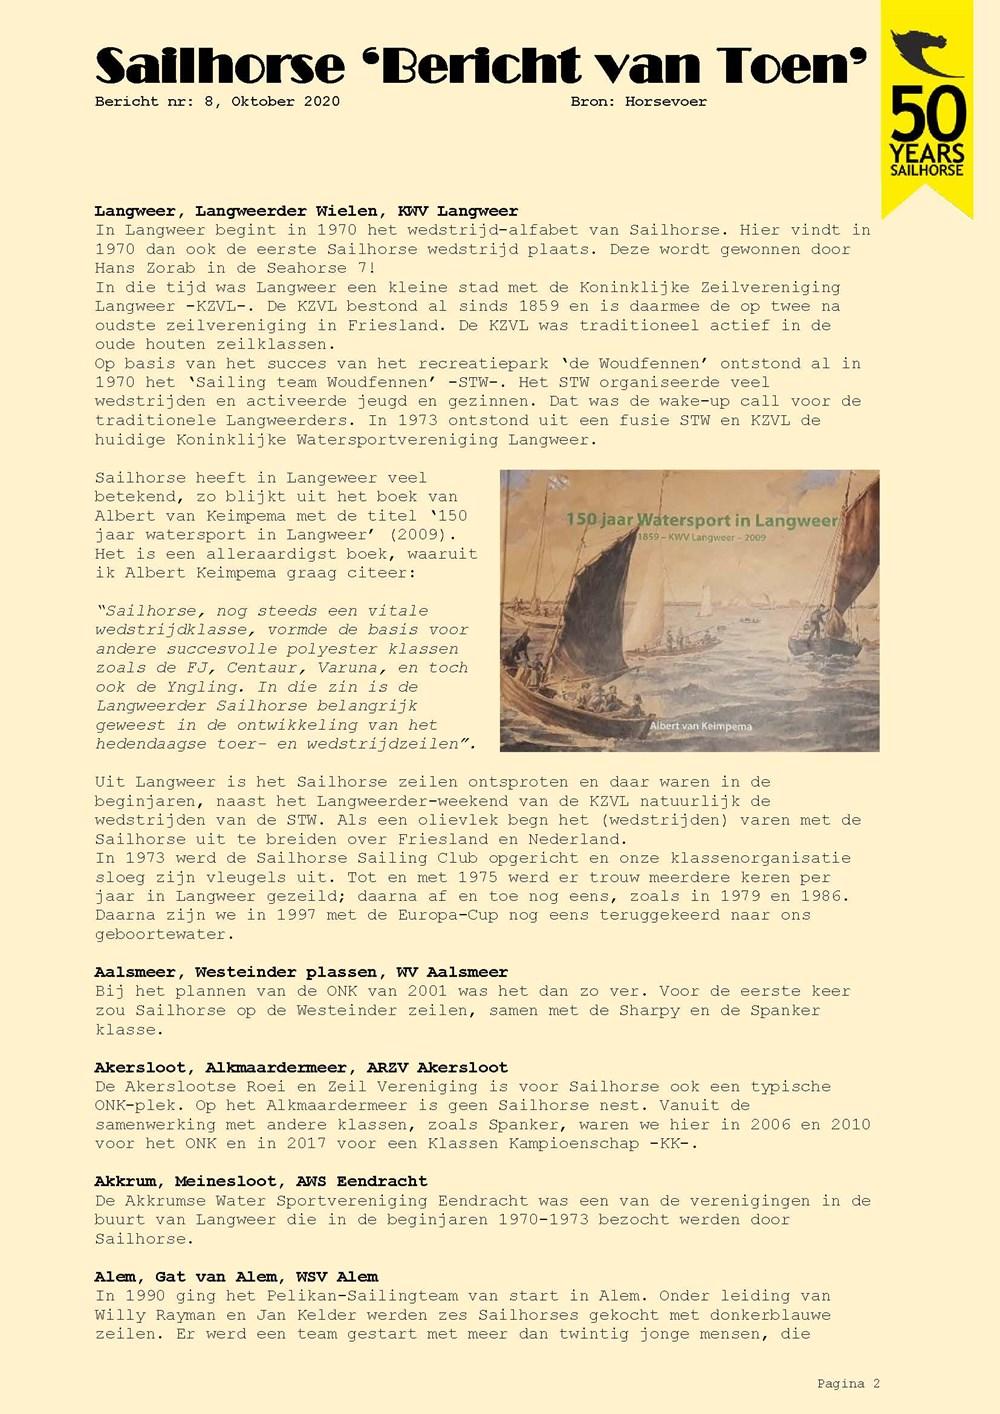 BvT8_Page_02.jpg